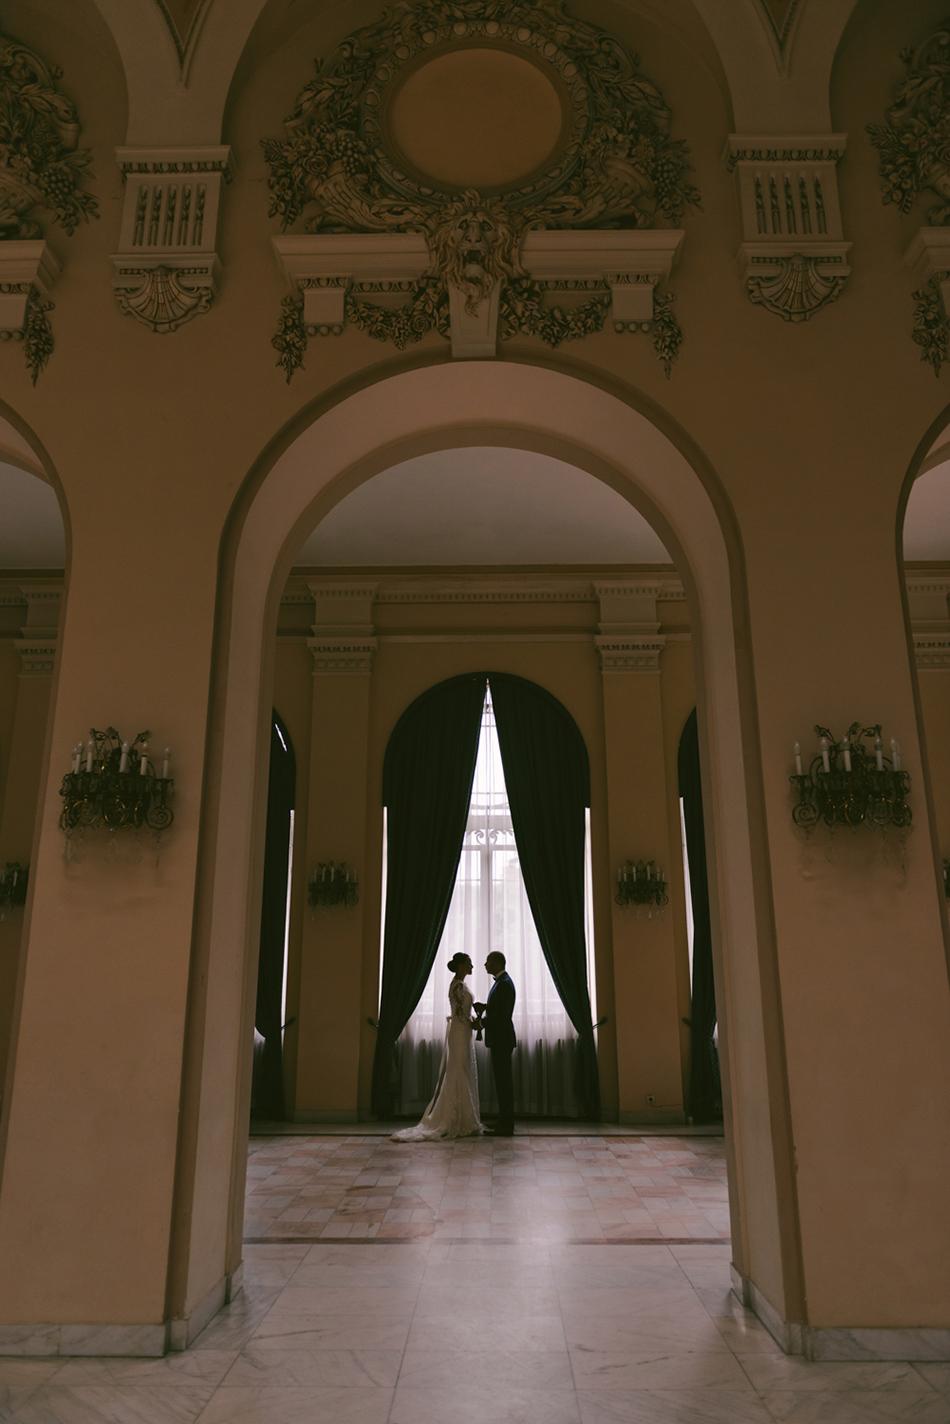 AD Passion Photography | fotograf-nunta-sinaia-flo-oana_0080 | Adelin, Dida, fotograf profesionist, fotograf de nunta, fotografie de nunta, fotograf Timisoara, fotograf Craiova, fotograf Bucuresti, fotograf Arad, nunta Timisoara, nunta Arad, nunta Bucuresti, nunta Craiova